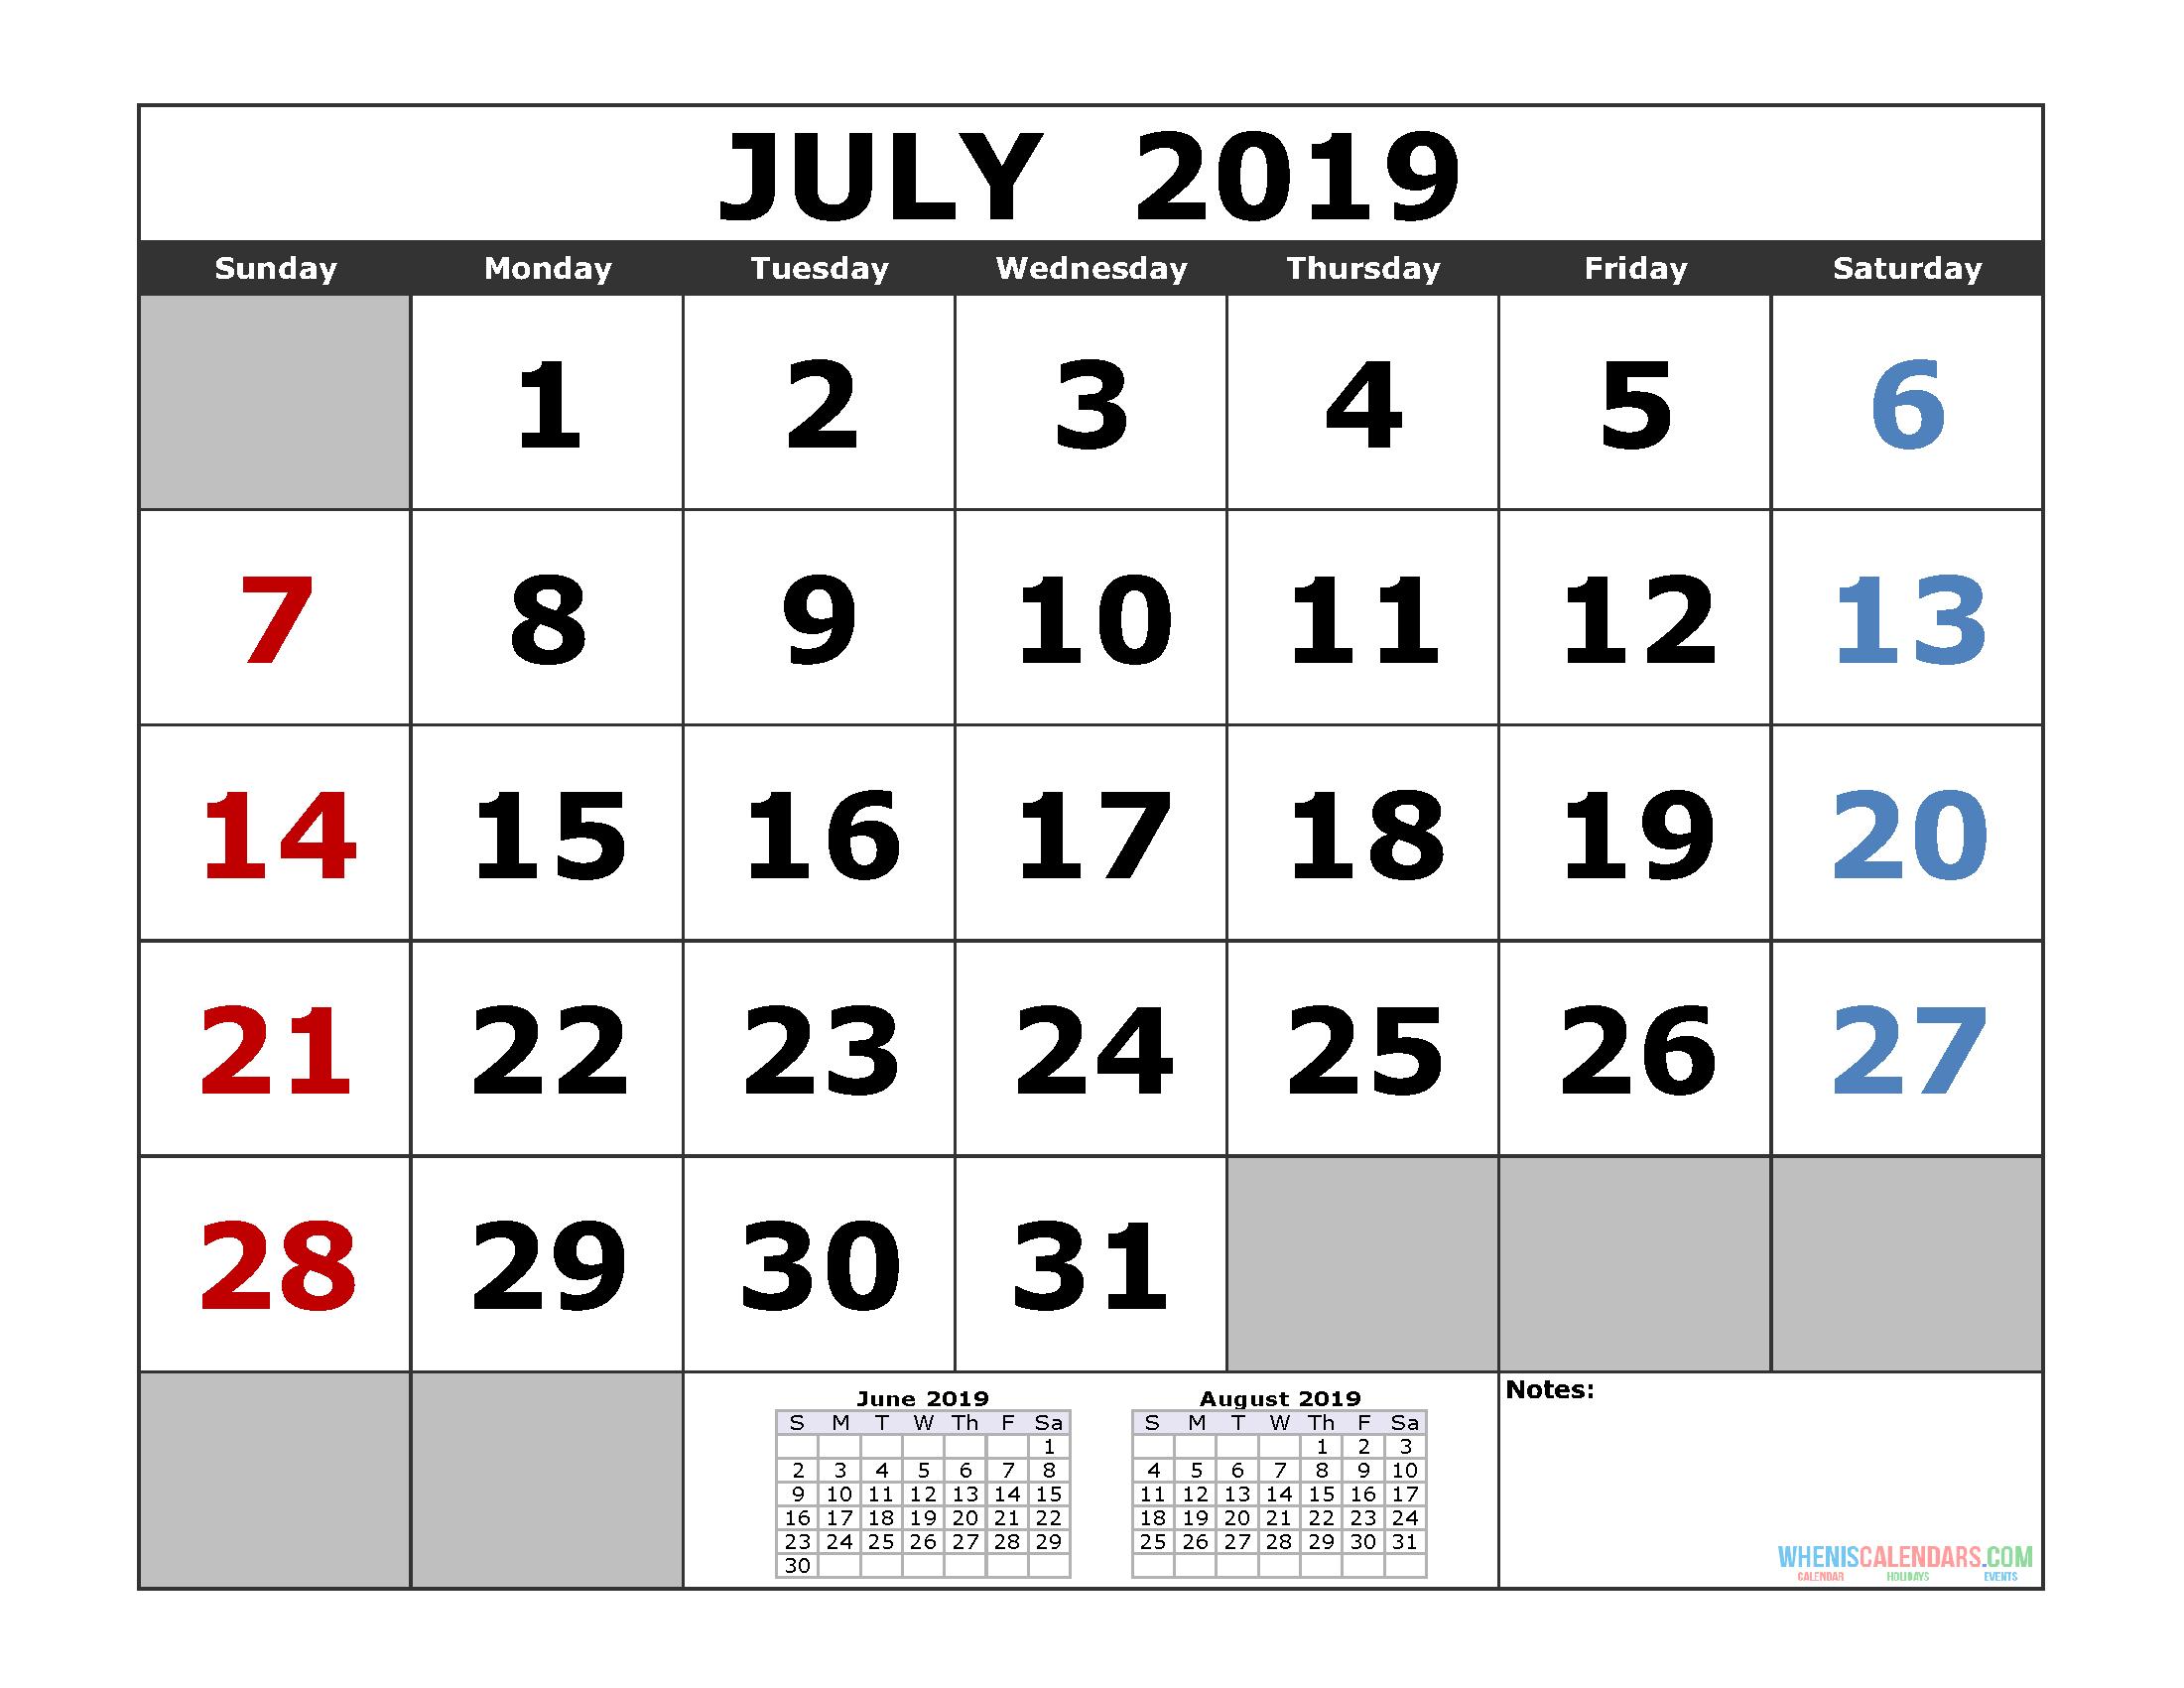 July 2019 Printable Calendar Template (3 Month Calendar)   Free July 3 2019 Calendar